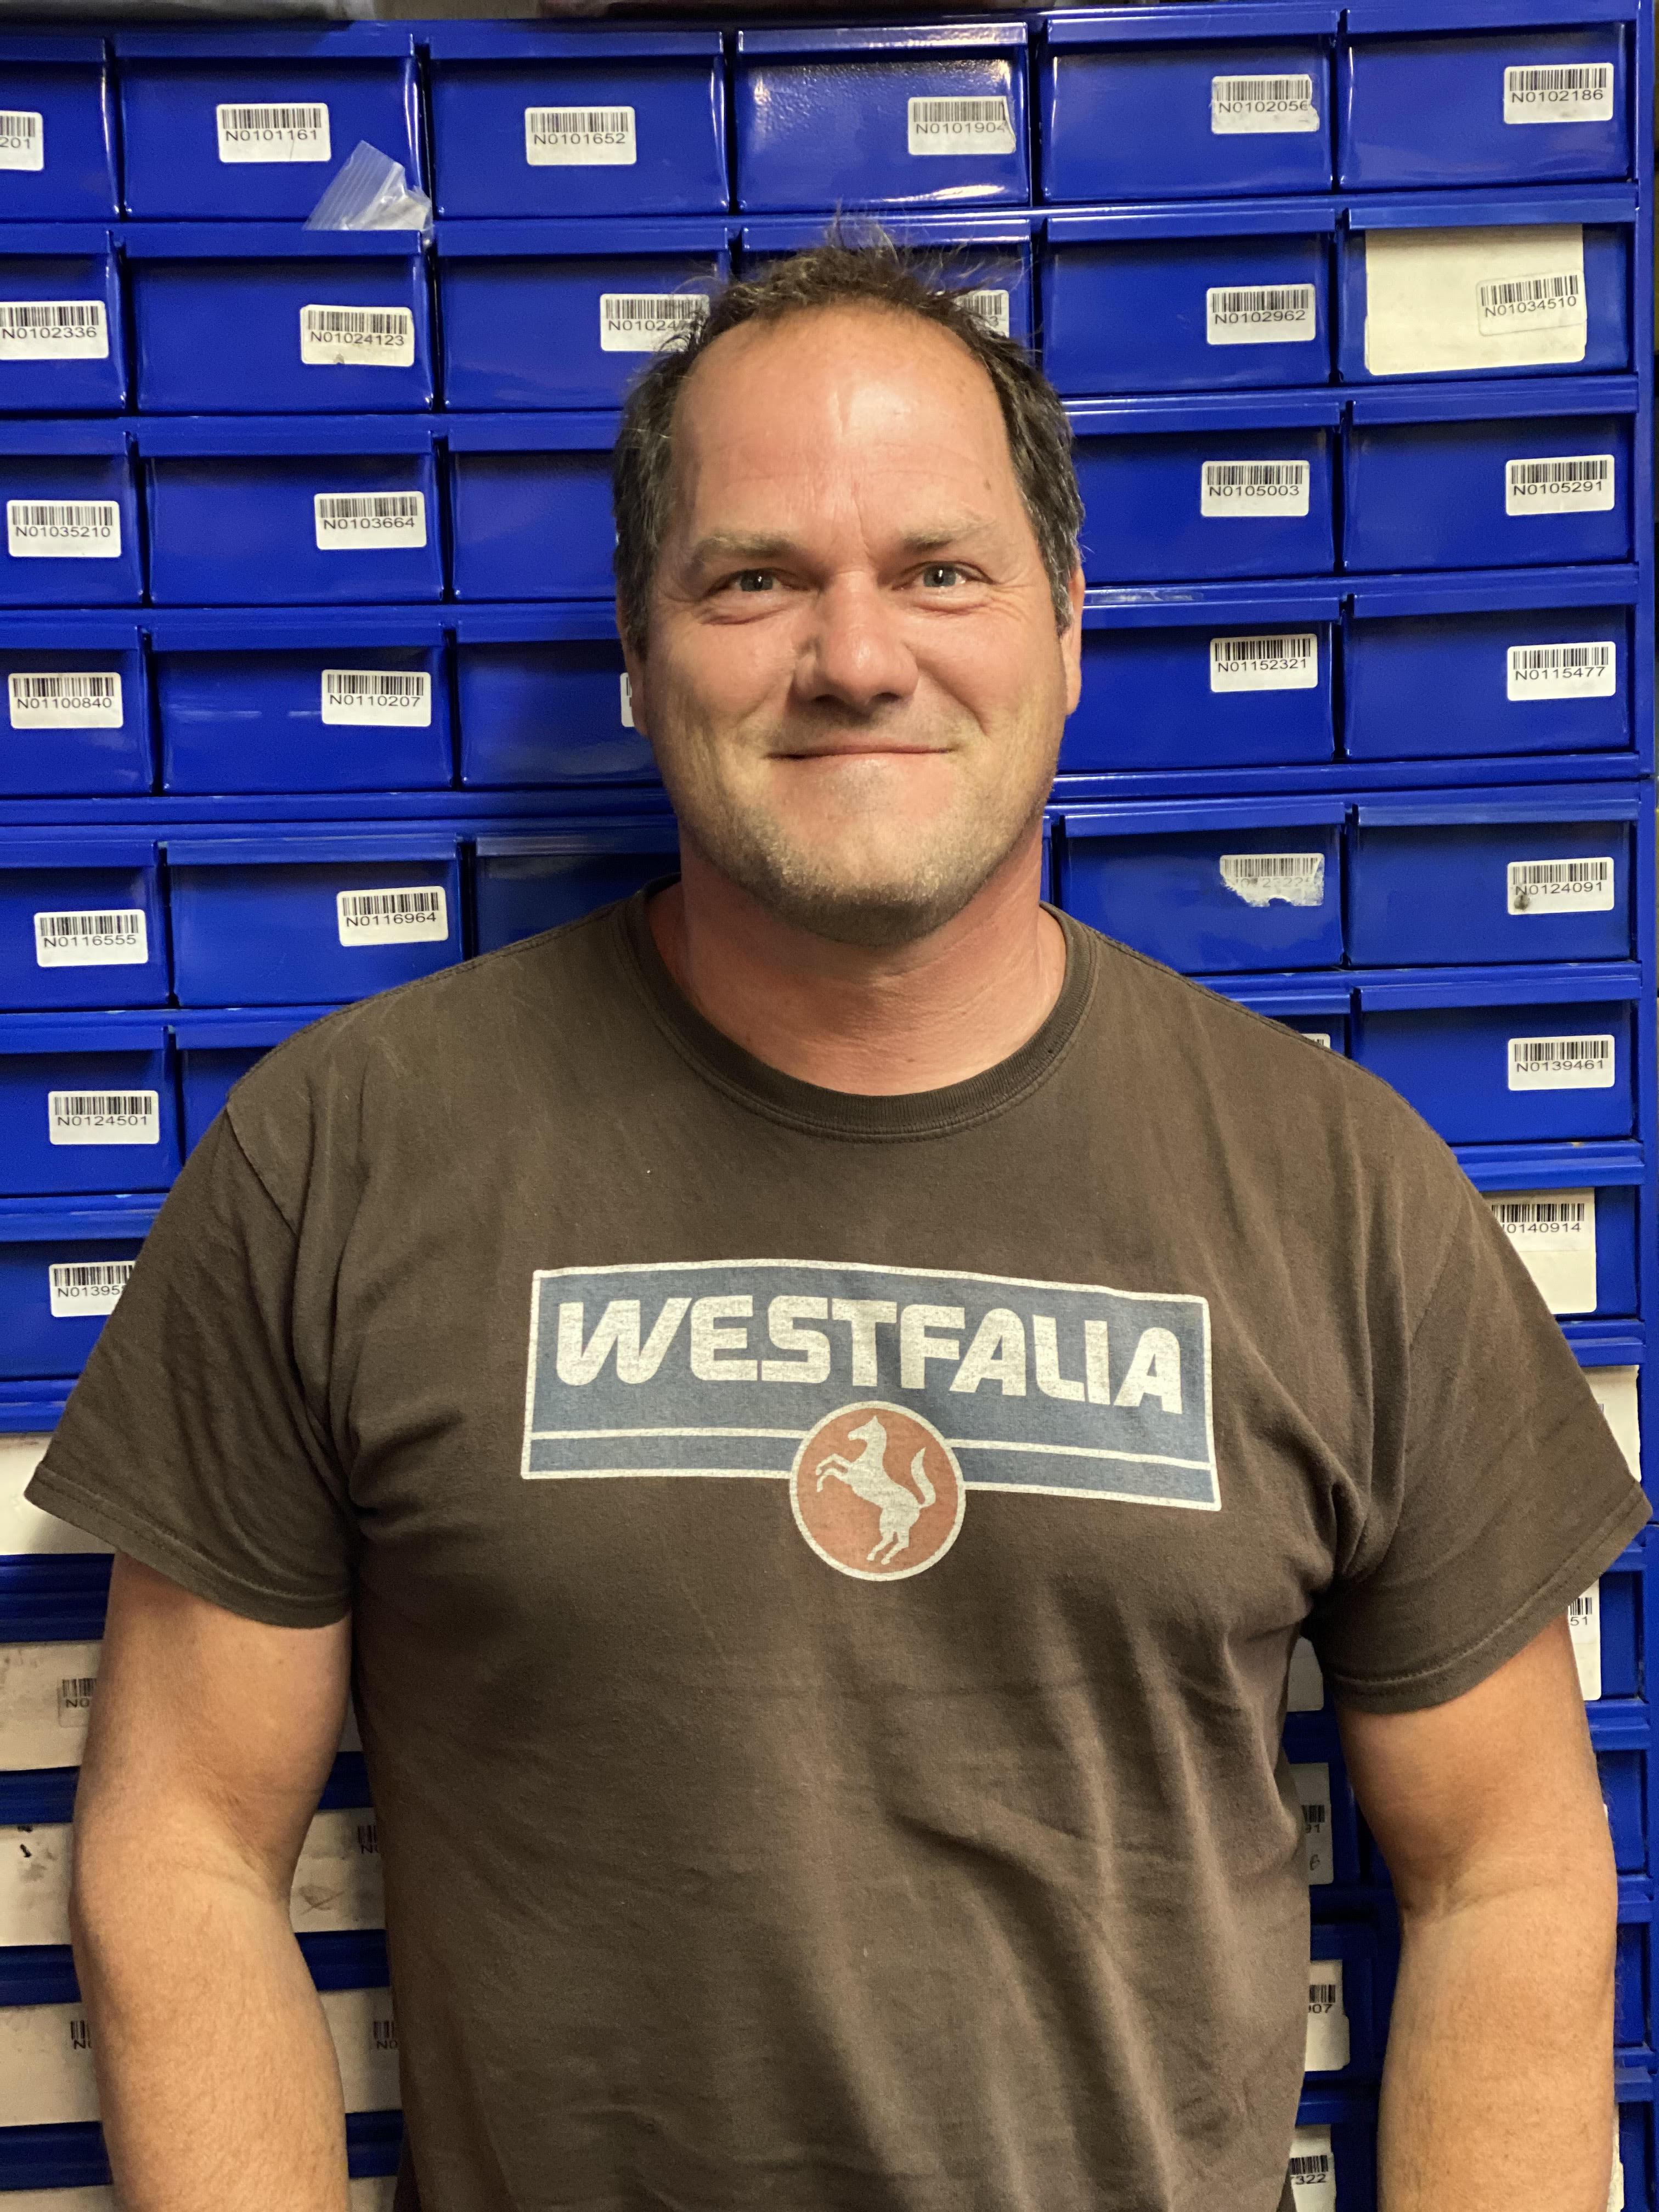 Marco Greywe, co-owner of Buslab